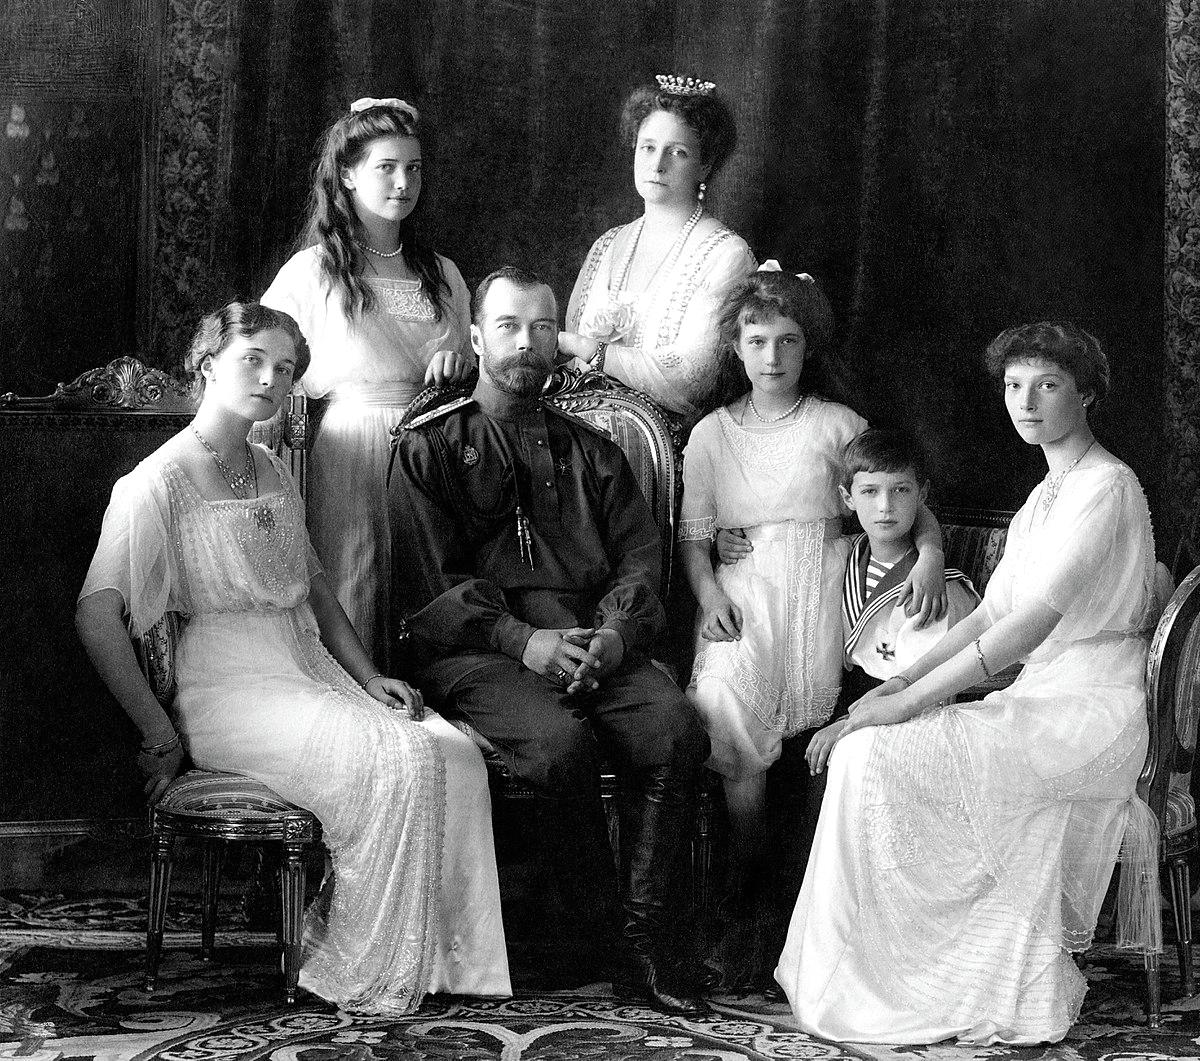 Lo zar Nicola II e la famiglia Romanov